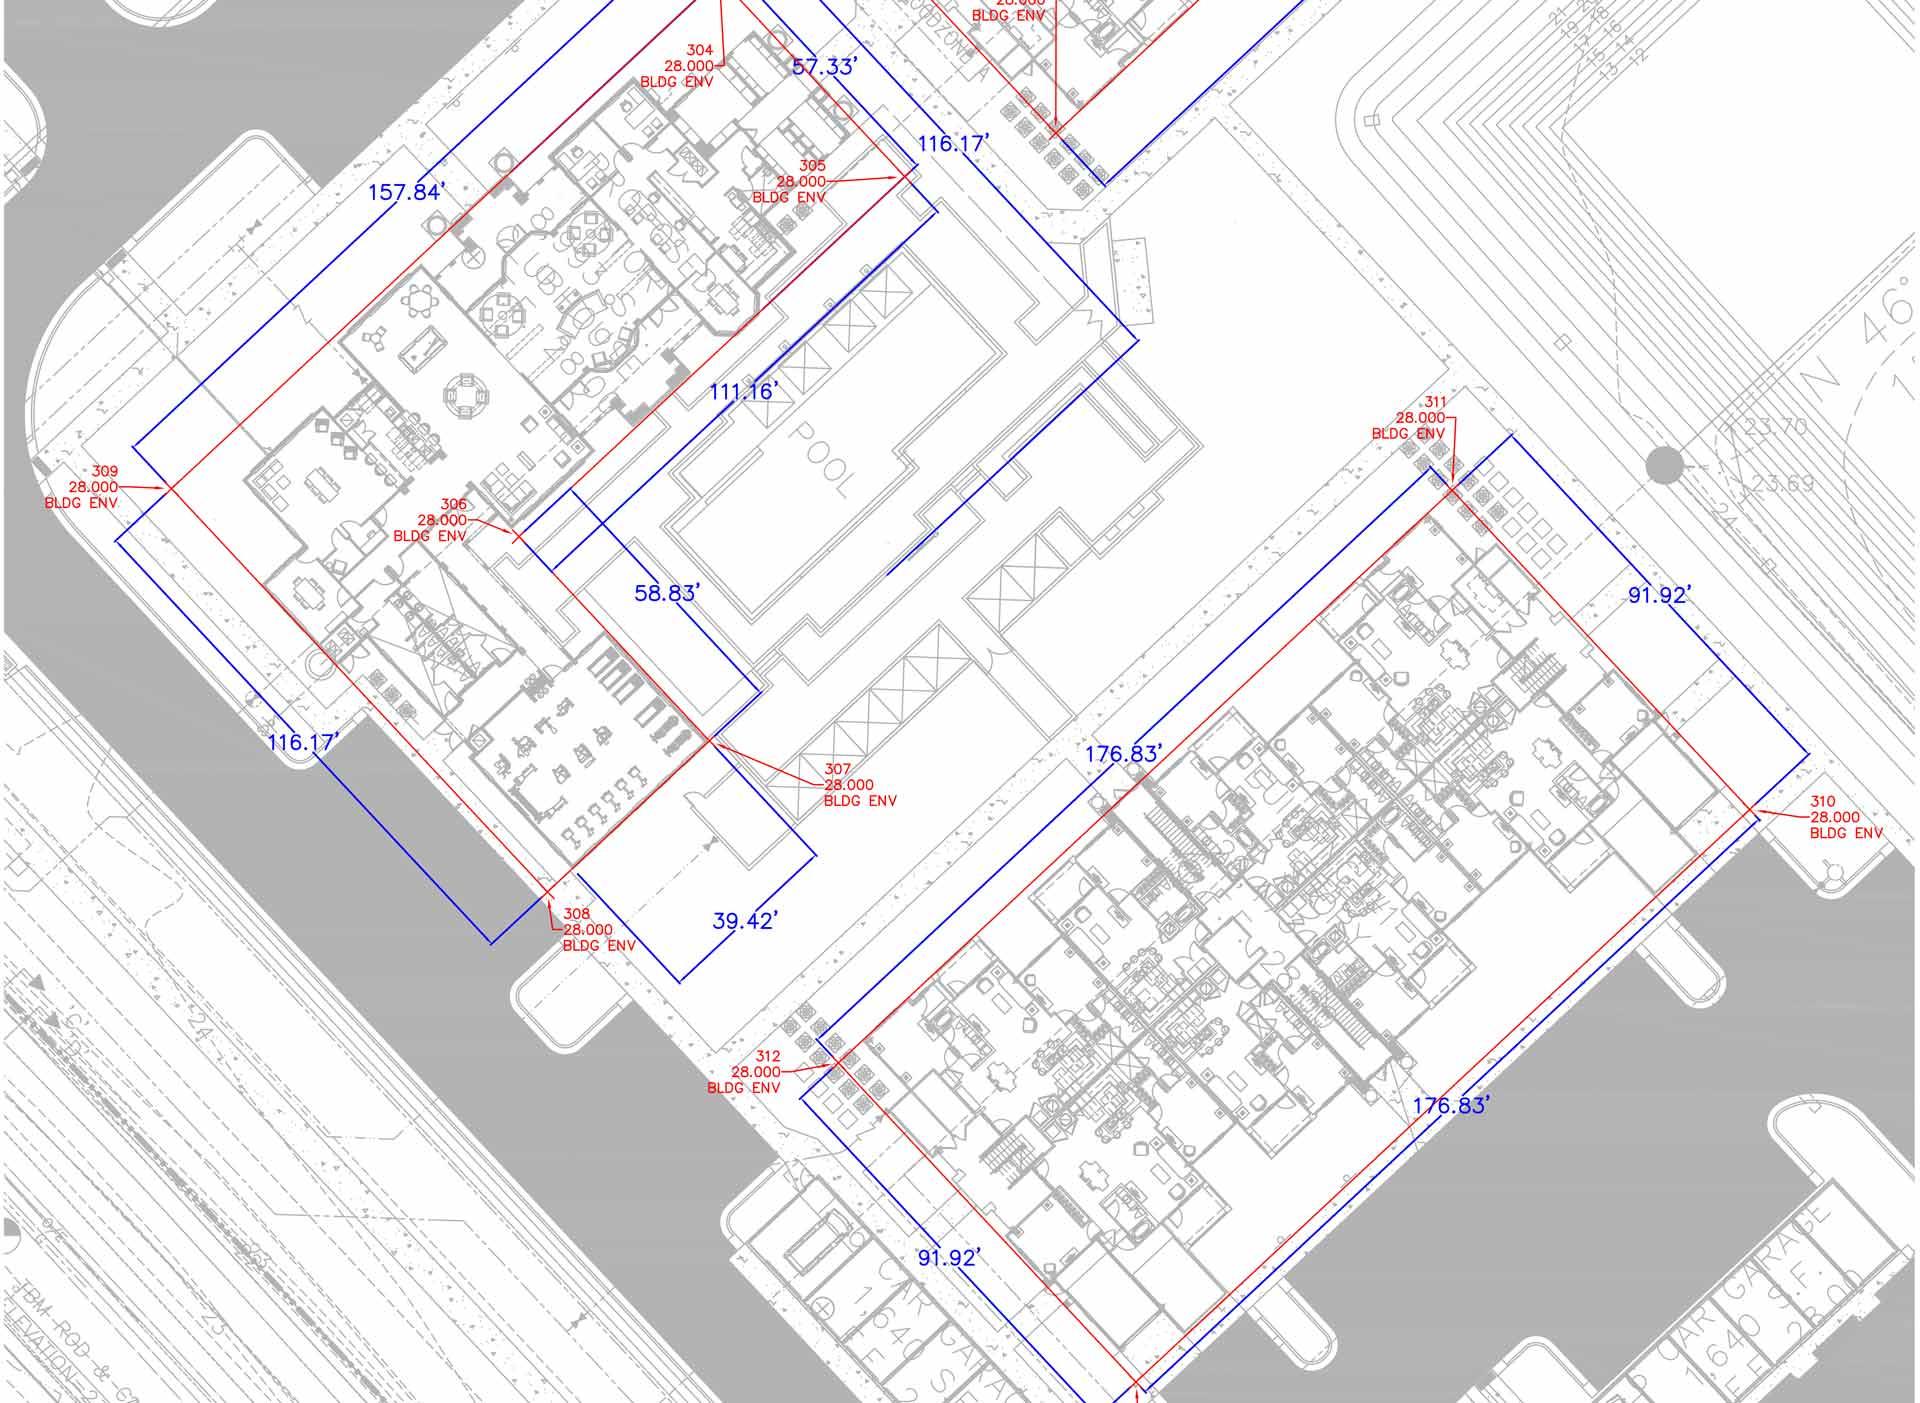 Napier building detailed